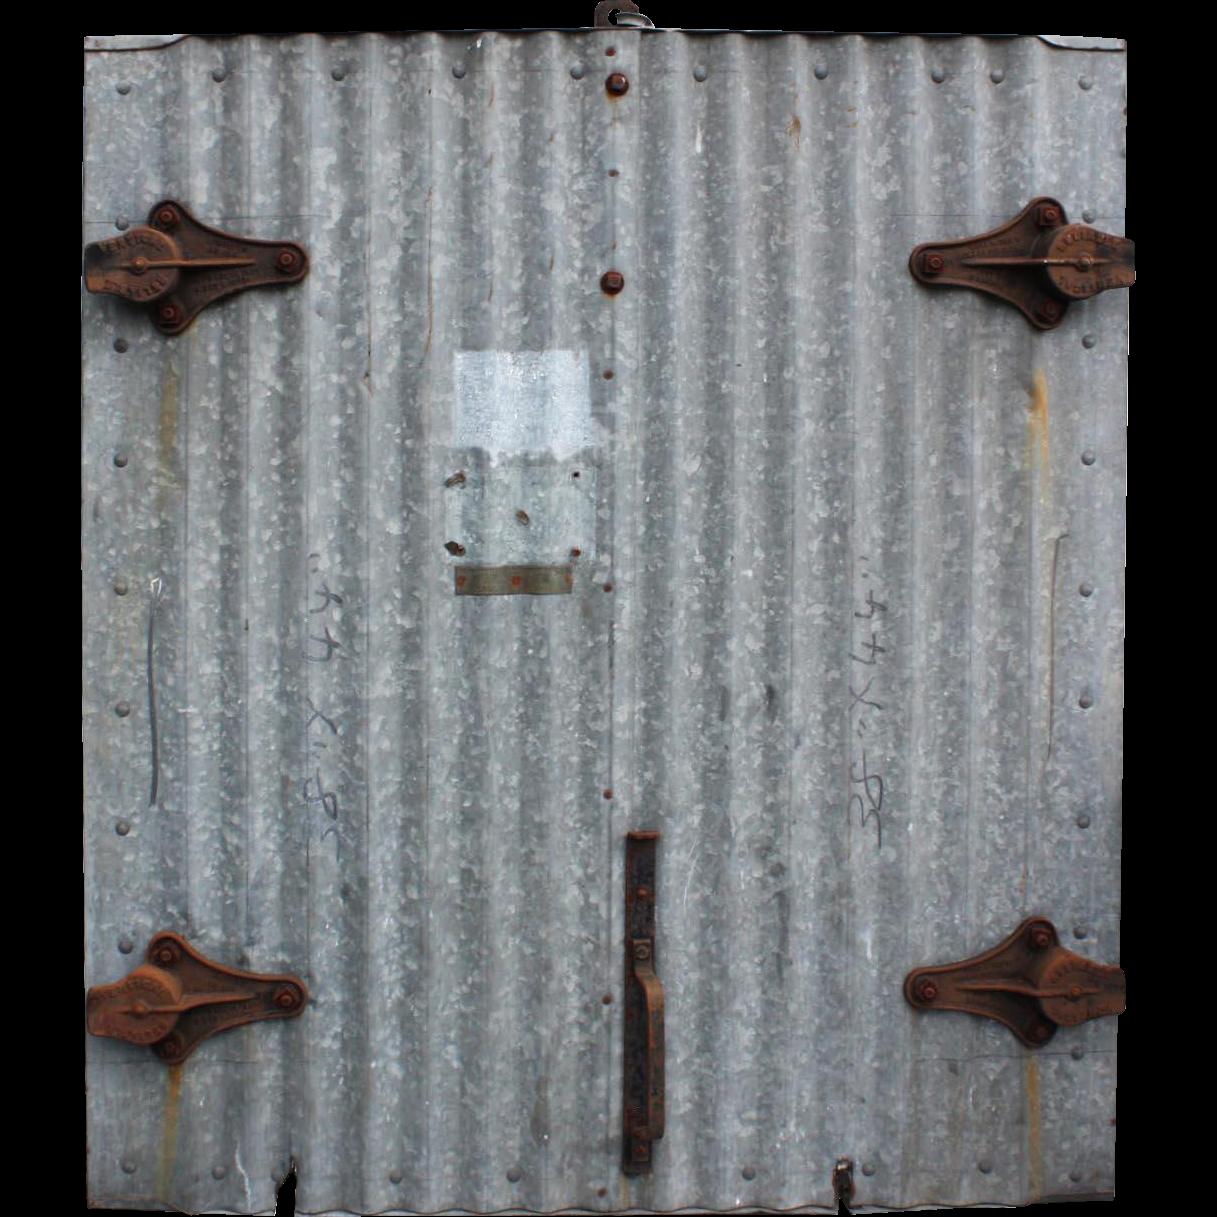 Vintage Industrial Fire Doors : Reclaimed antique industrial corrugated fire door for wall